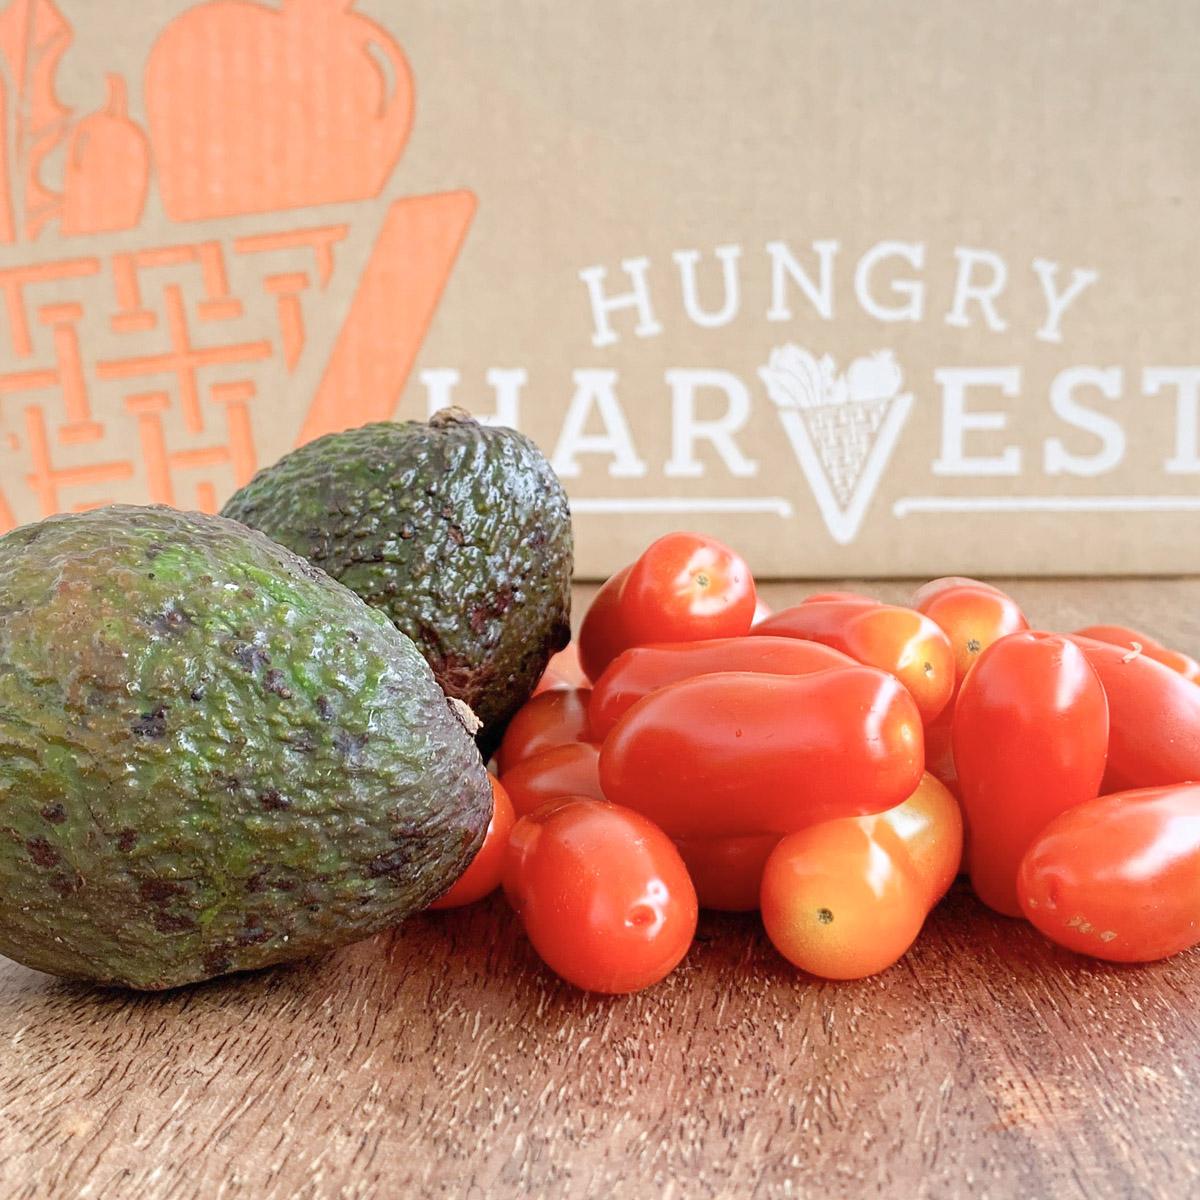 Tomato Avocado SaladHealthy, flavorful and a cinch to prepare. - Find the recipe at: Cooktoria